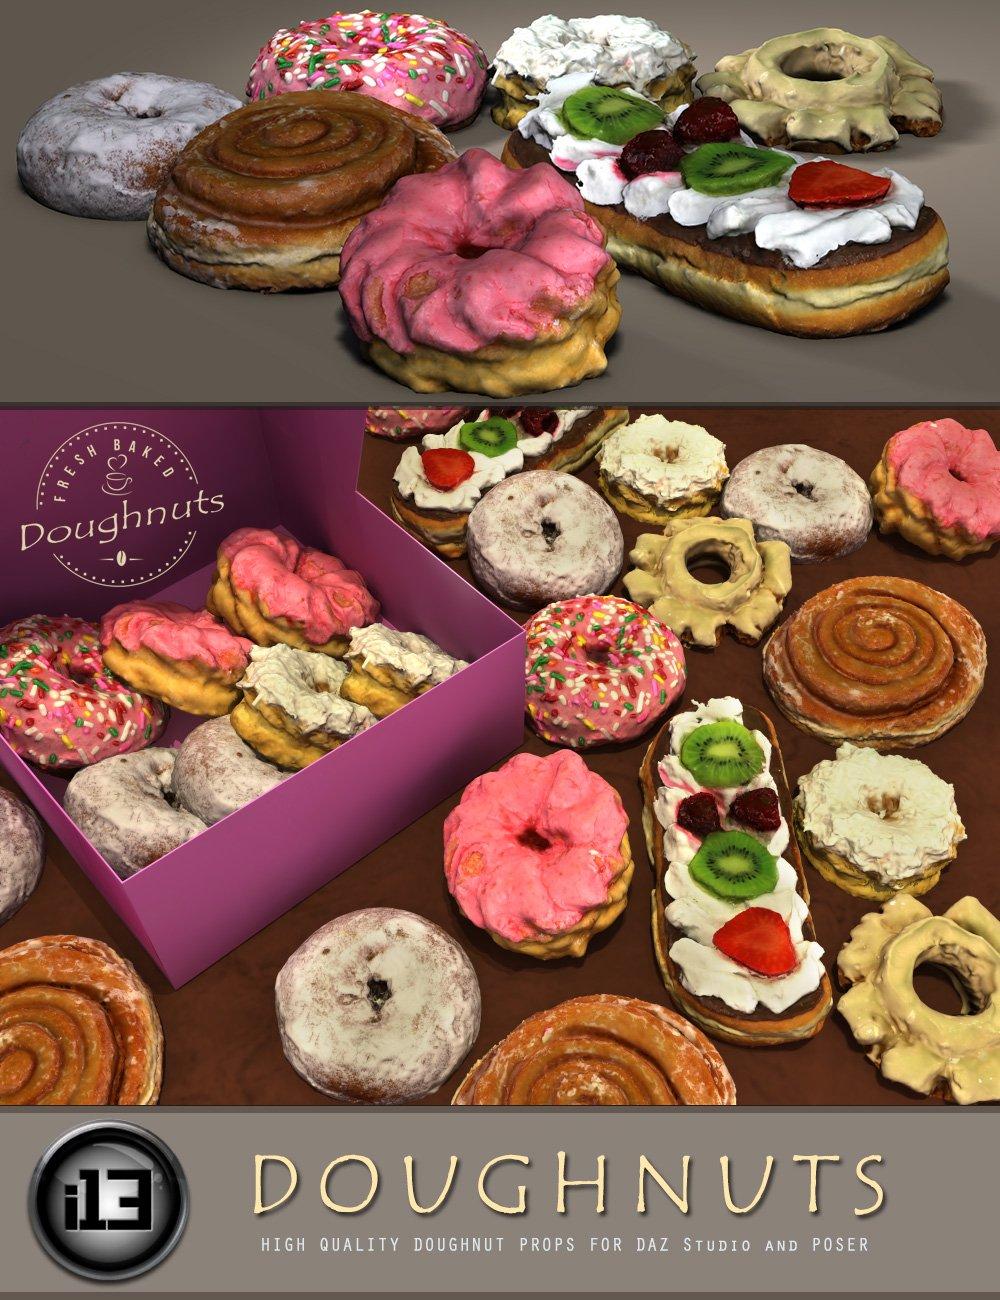 i13 Doughnuts by: ironman13, 3D Models by Daz 3D